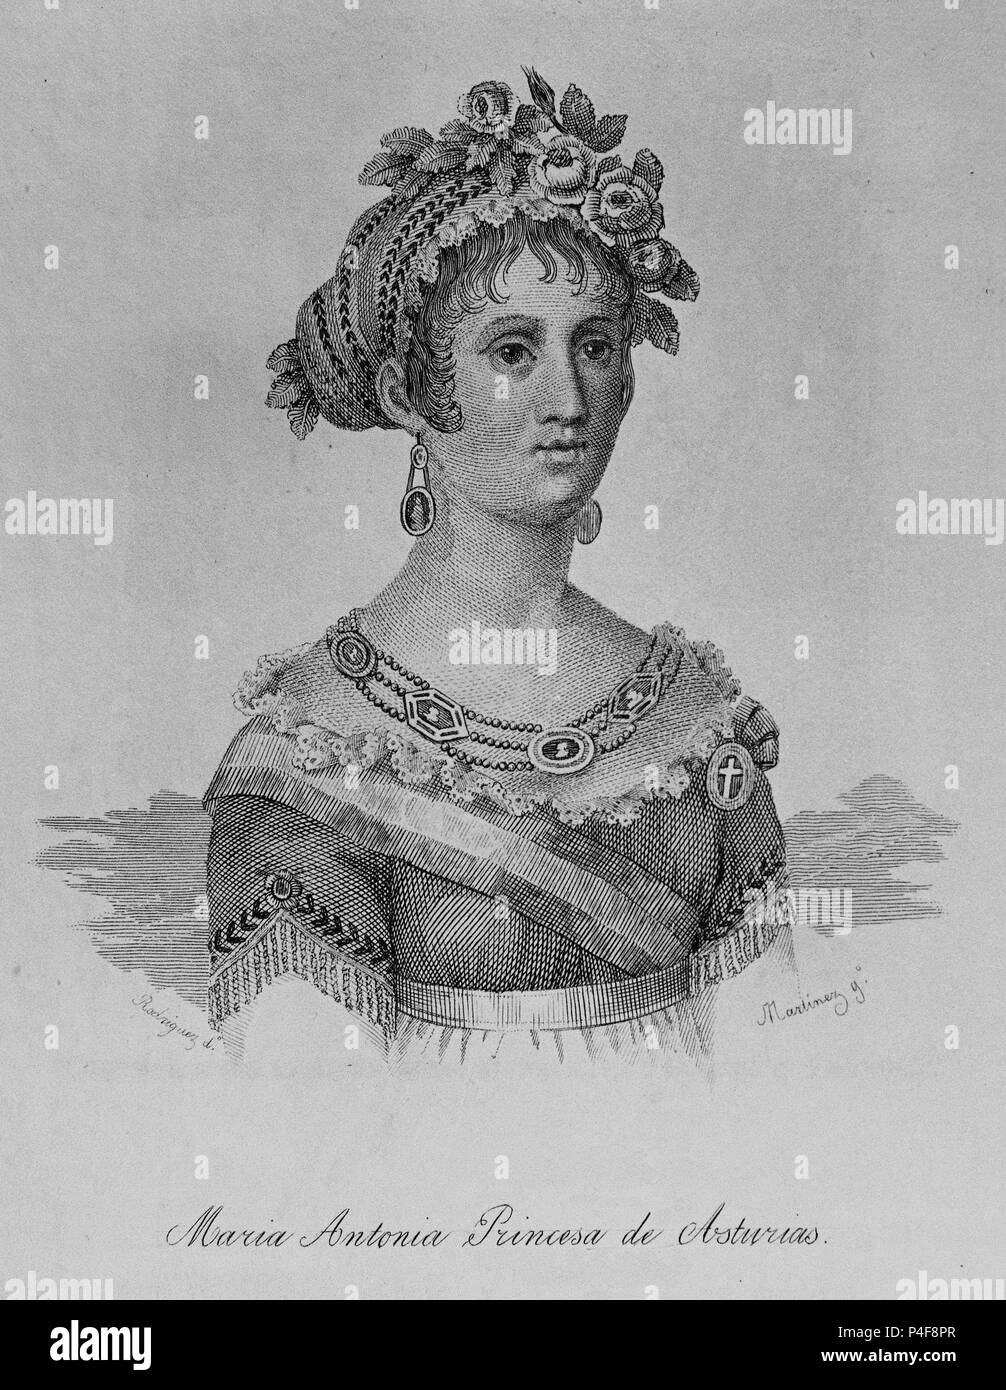 Marie Antoinette de Bourbon (1784-1806), Princesa de Asturias. Grabado. Siglo xix. Autor: Rodríguez. Foto de stock